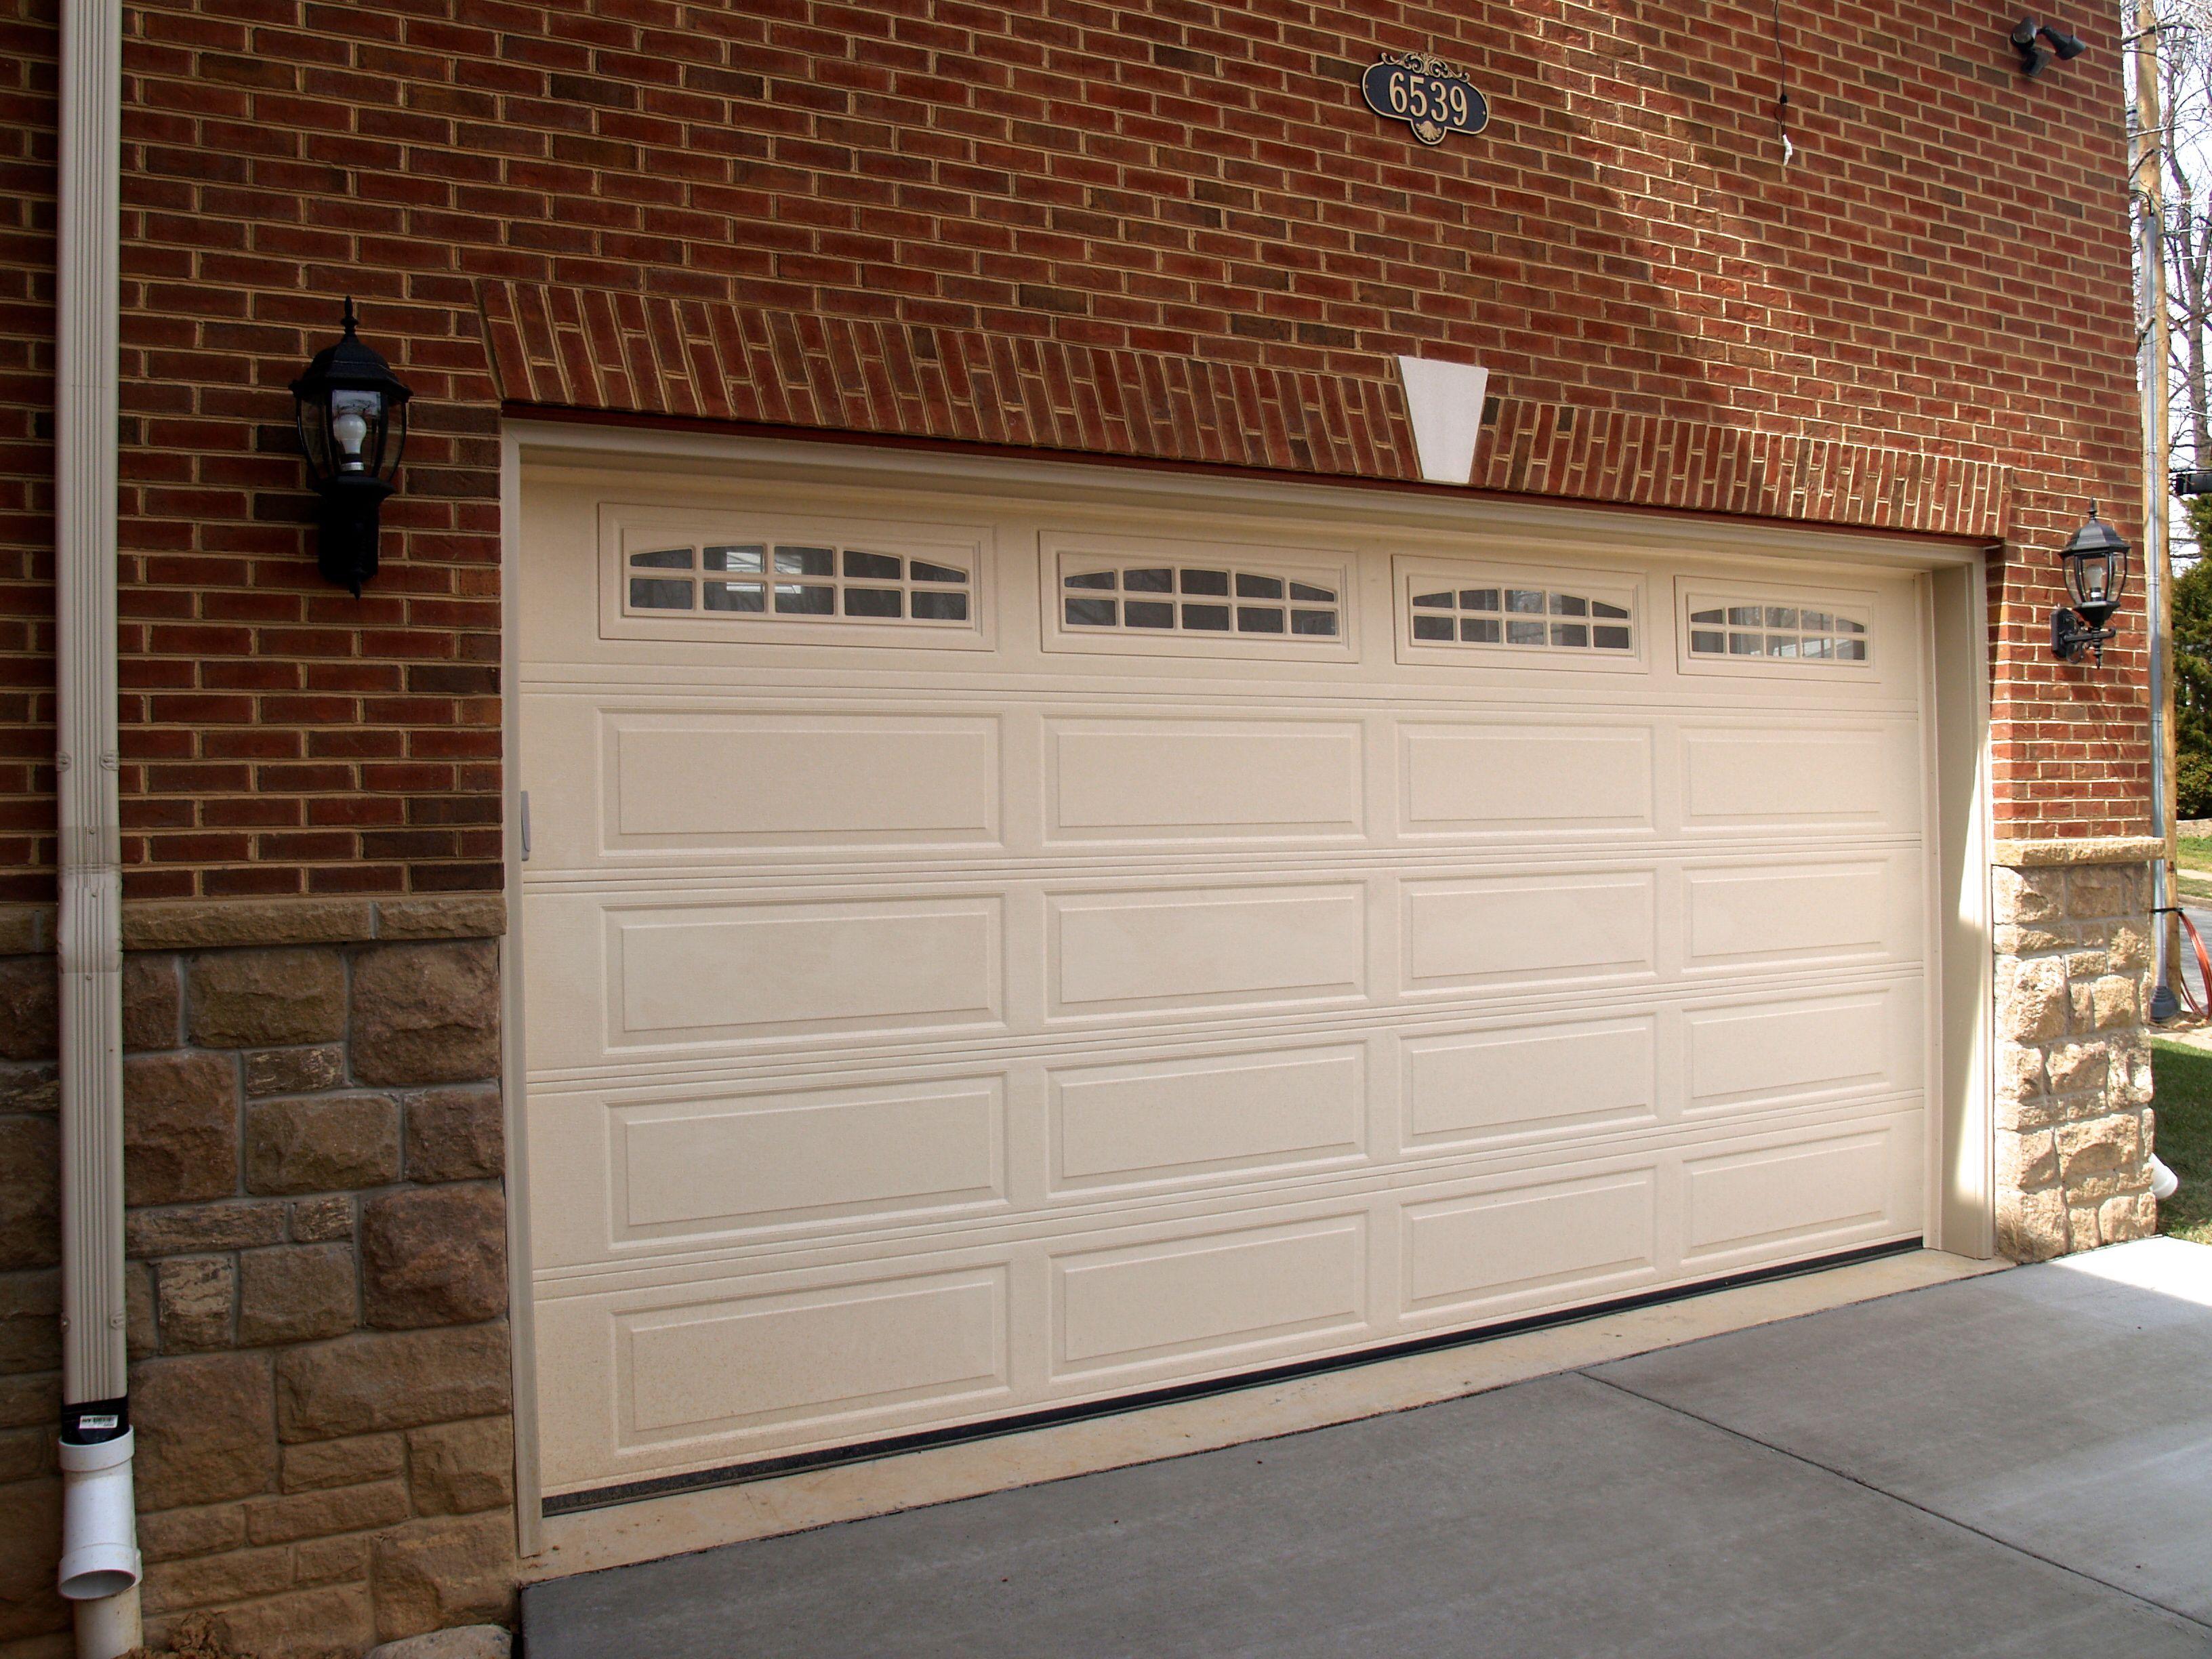 2448 #3C2214 Pin By Showroom Partners On Garage Doors By Wayne Dalton Pinterest save image Wayne Dalton Insulated Garage Doors 38373264